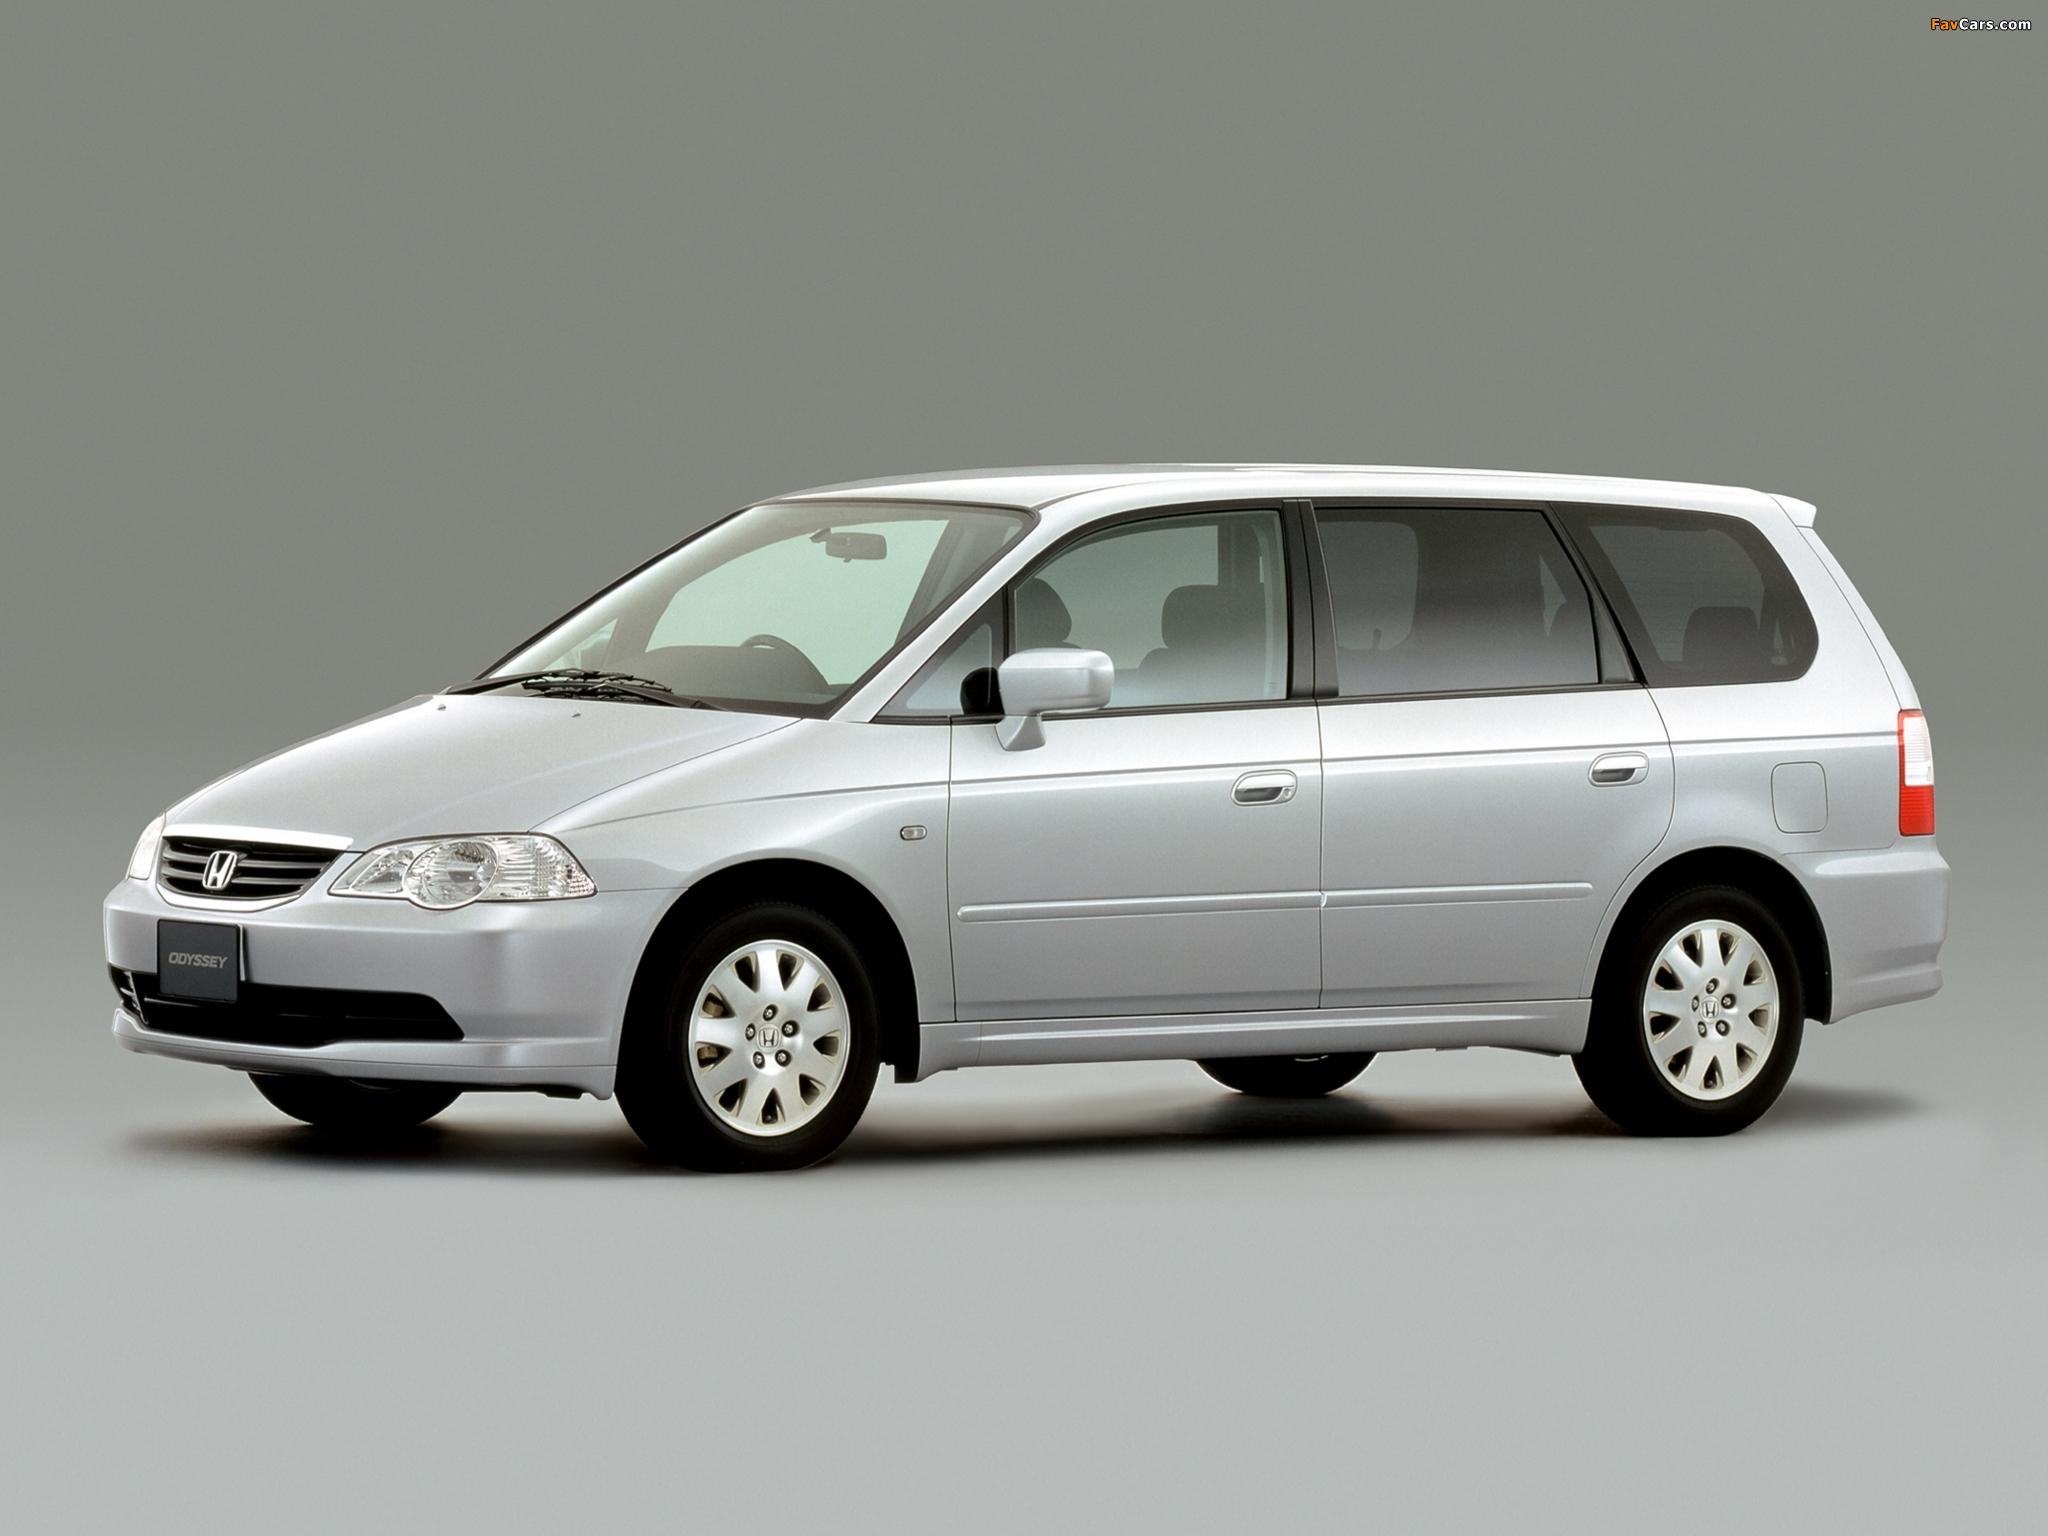 Honda Odyssey JP-spec 1999-2001 pictures (2048x1536)